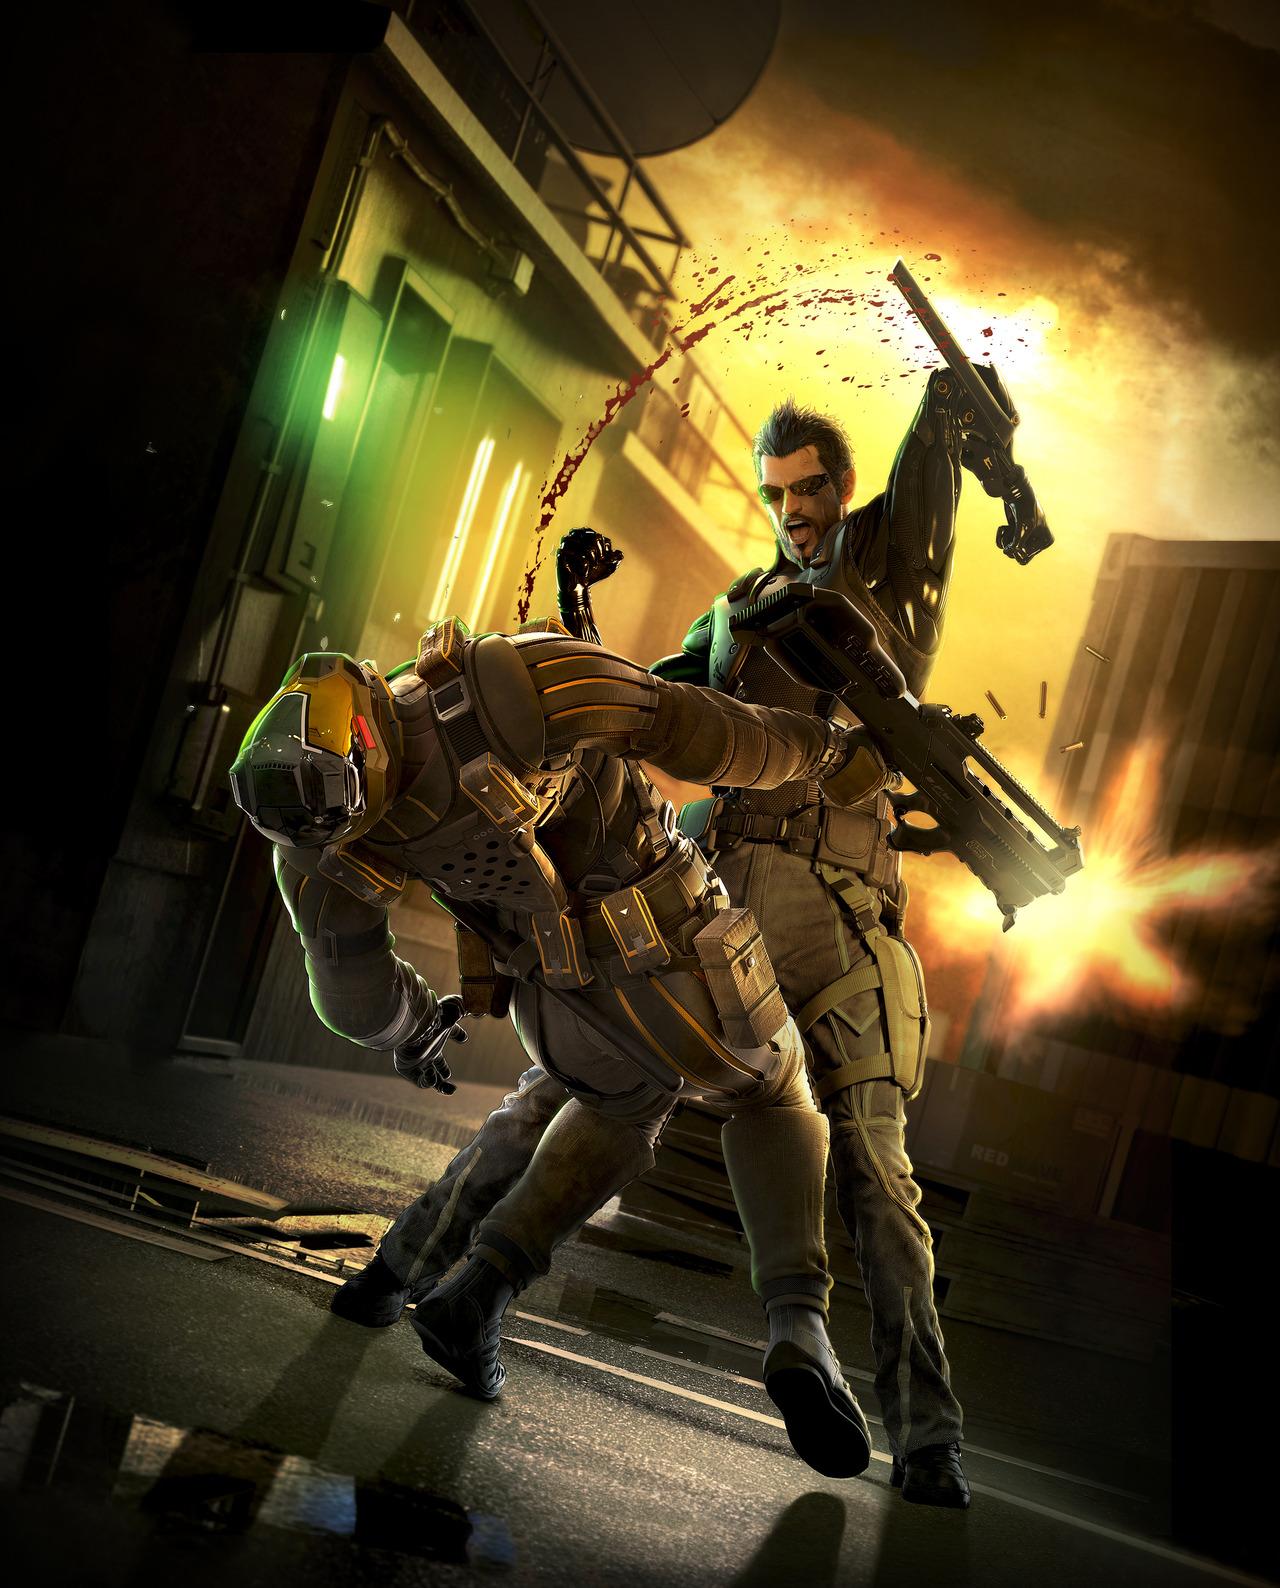 E3 2011 Galerie: Deus Ex: Human Revolution 43925